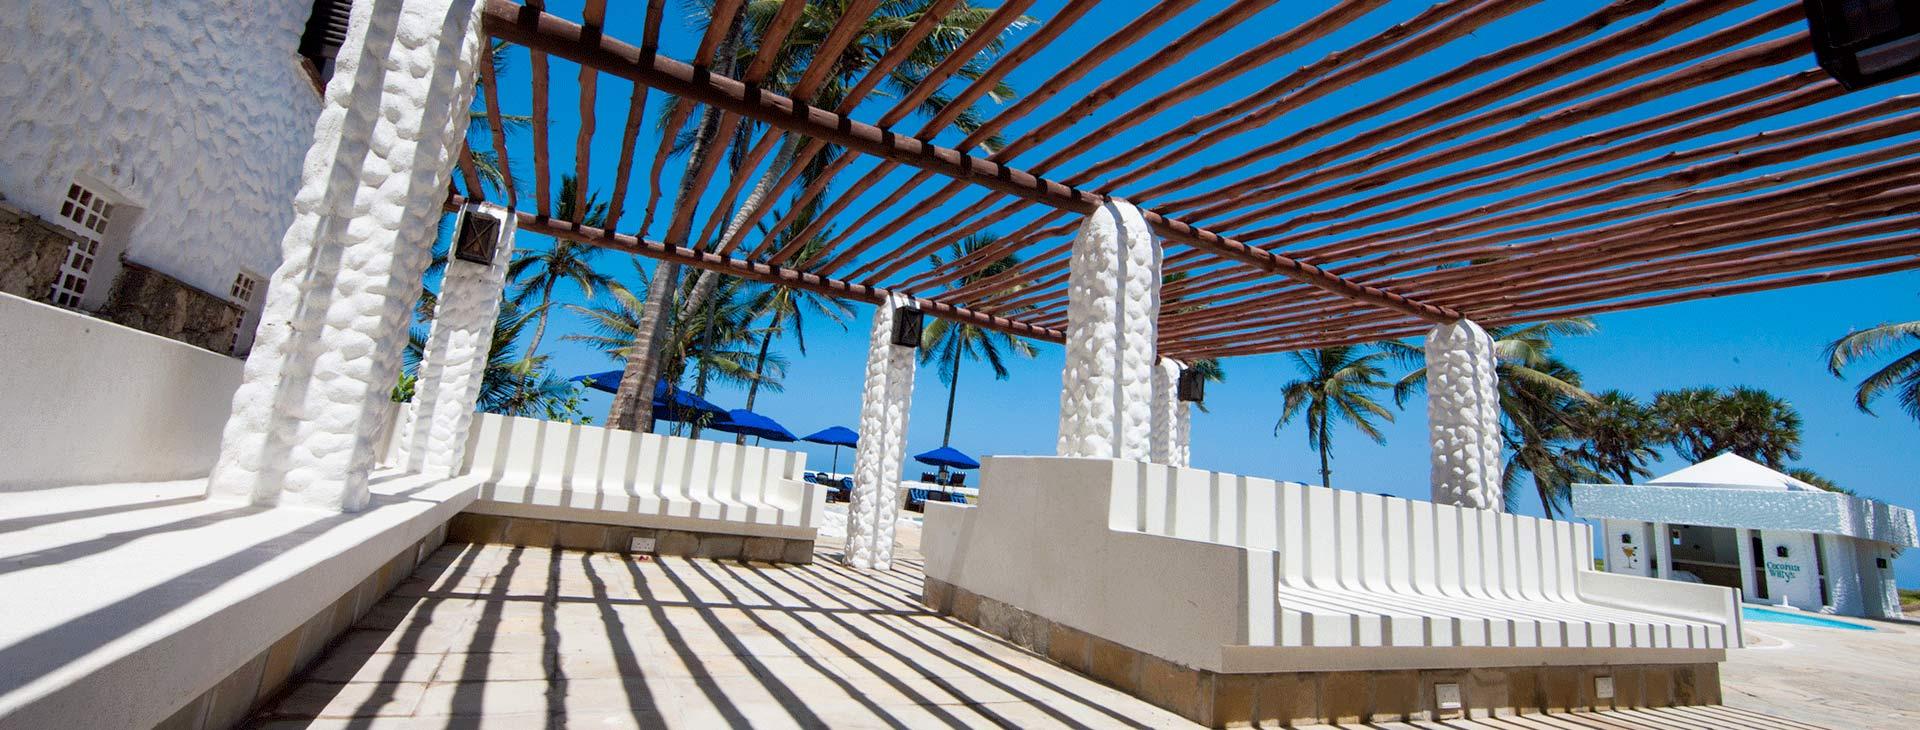 Indian Ocean Beach Resort